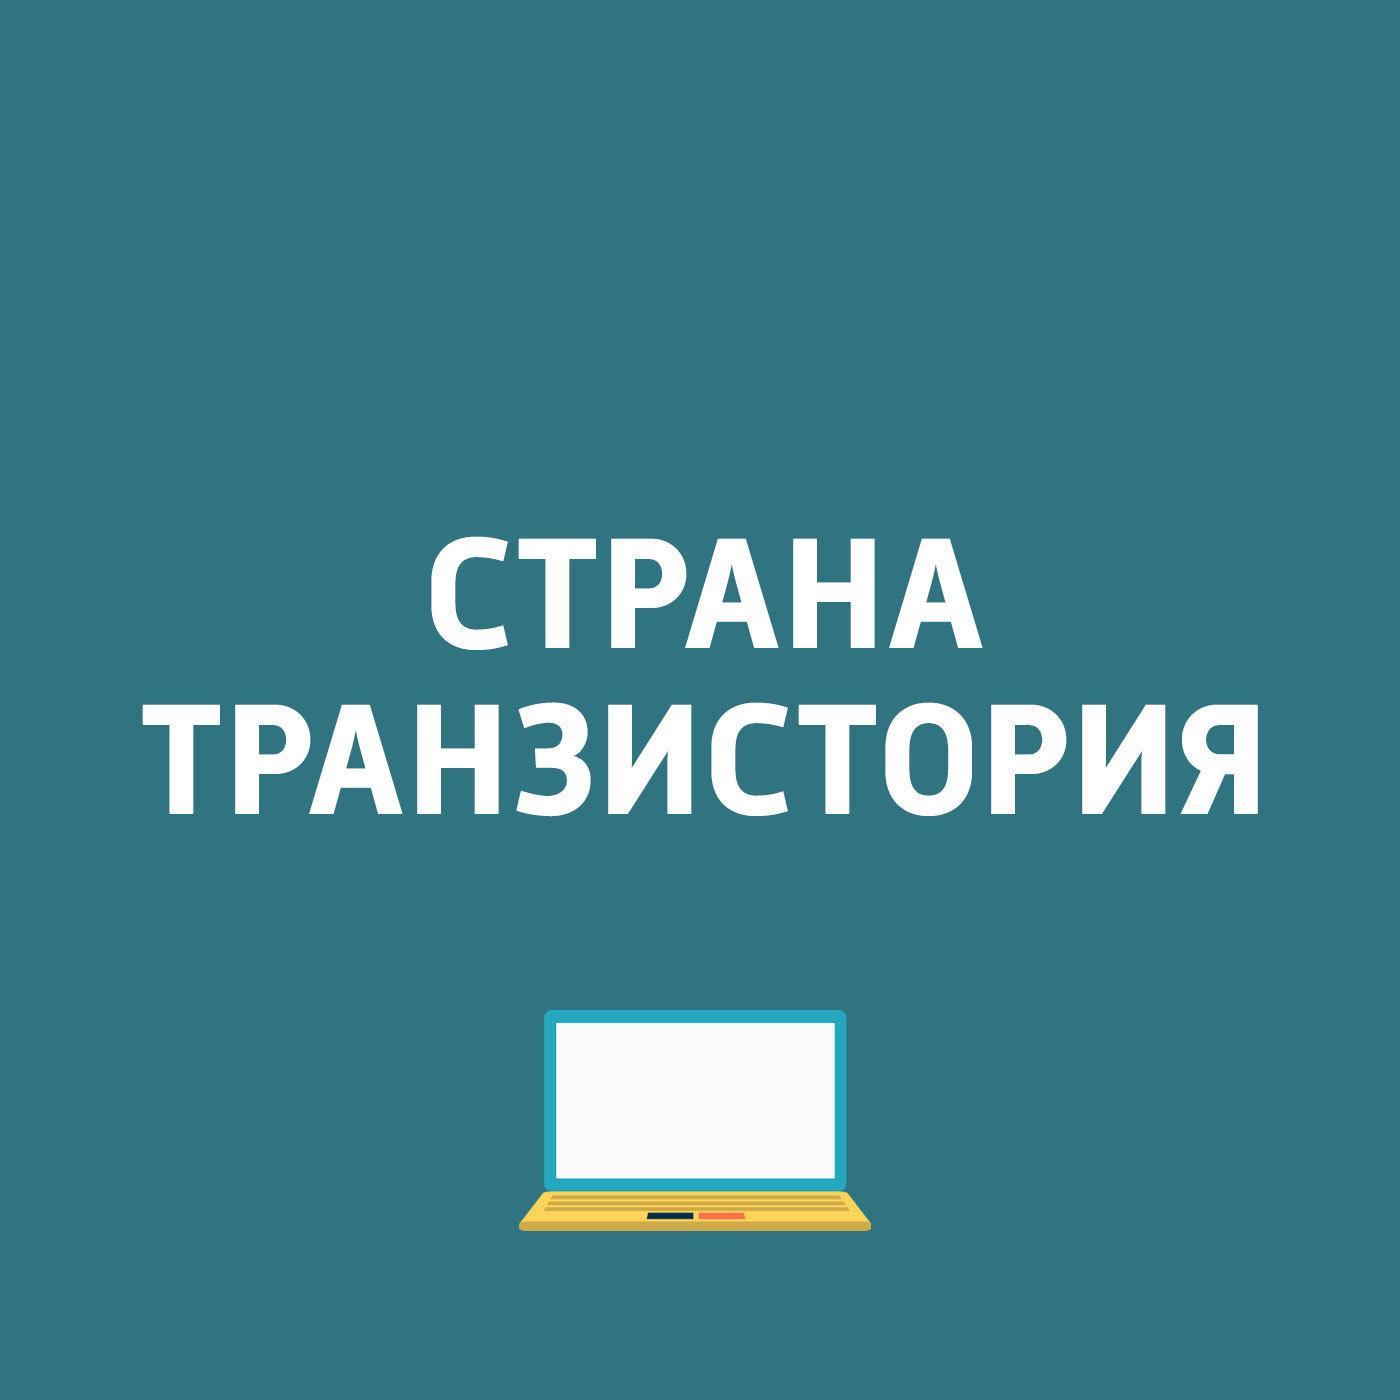 Картаев Павел Meizu M5; Девять российских банков начали работать с Apple Pay... for huawei mate 7 lcd display touch screen 100